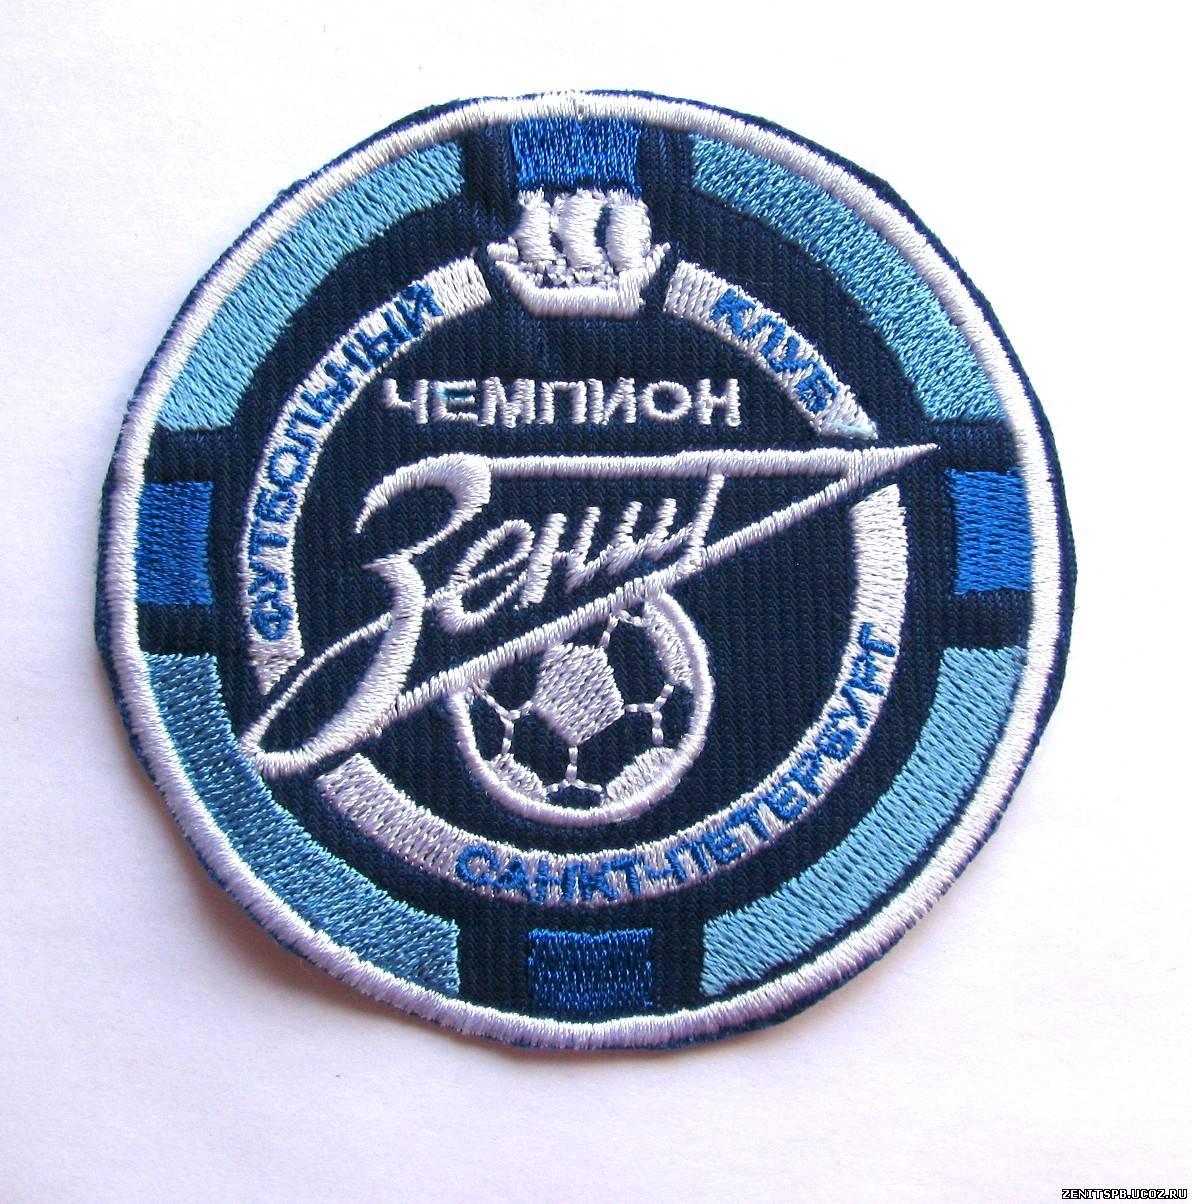 Значки зенита, бесплатные фото, обои ...: pictures11.ru/znachki-zenita.html